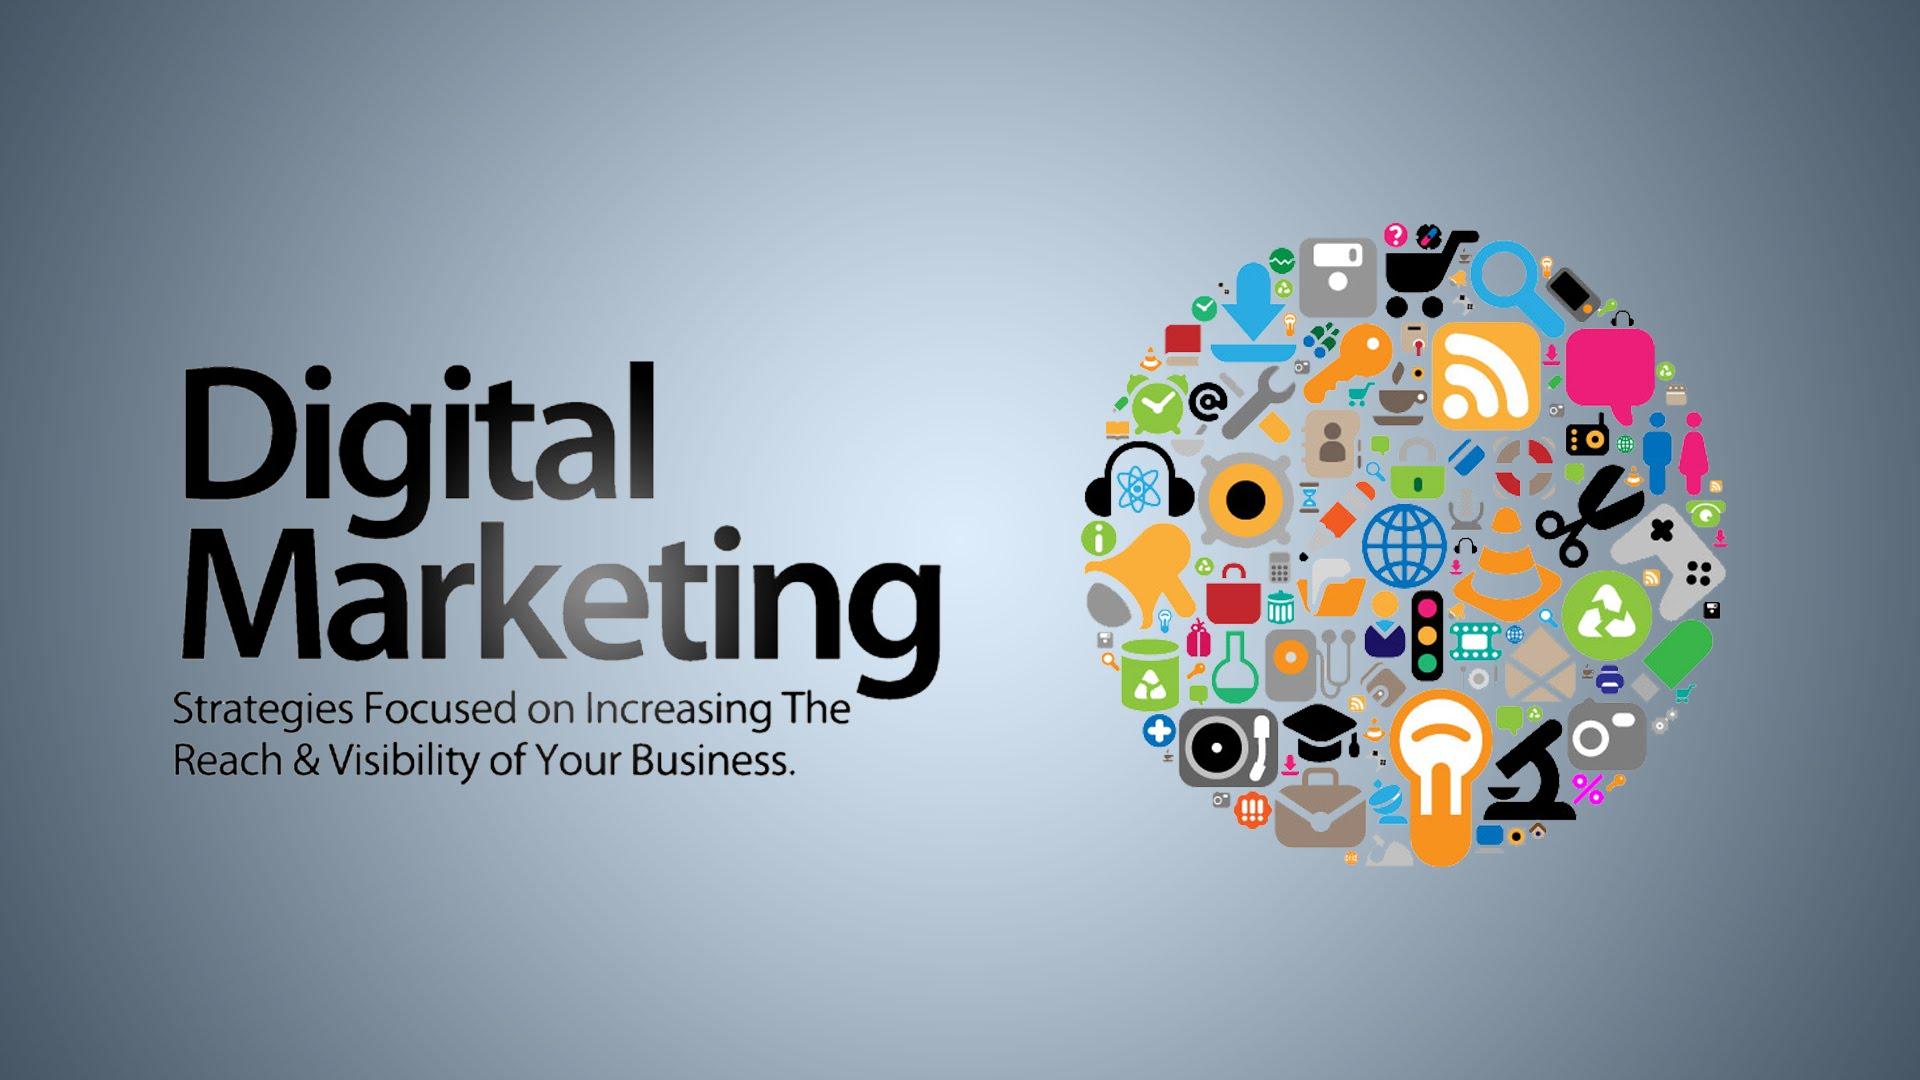 When It Is Digital Marketing vs Internet Marketing vs Online Marketing